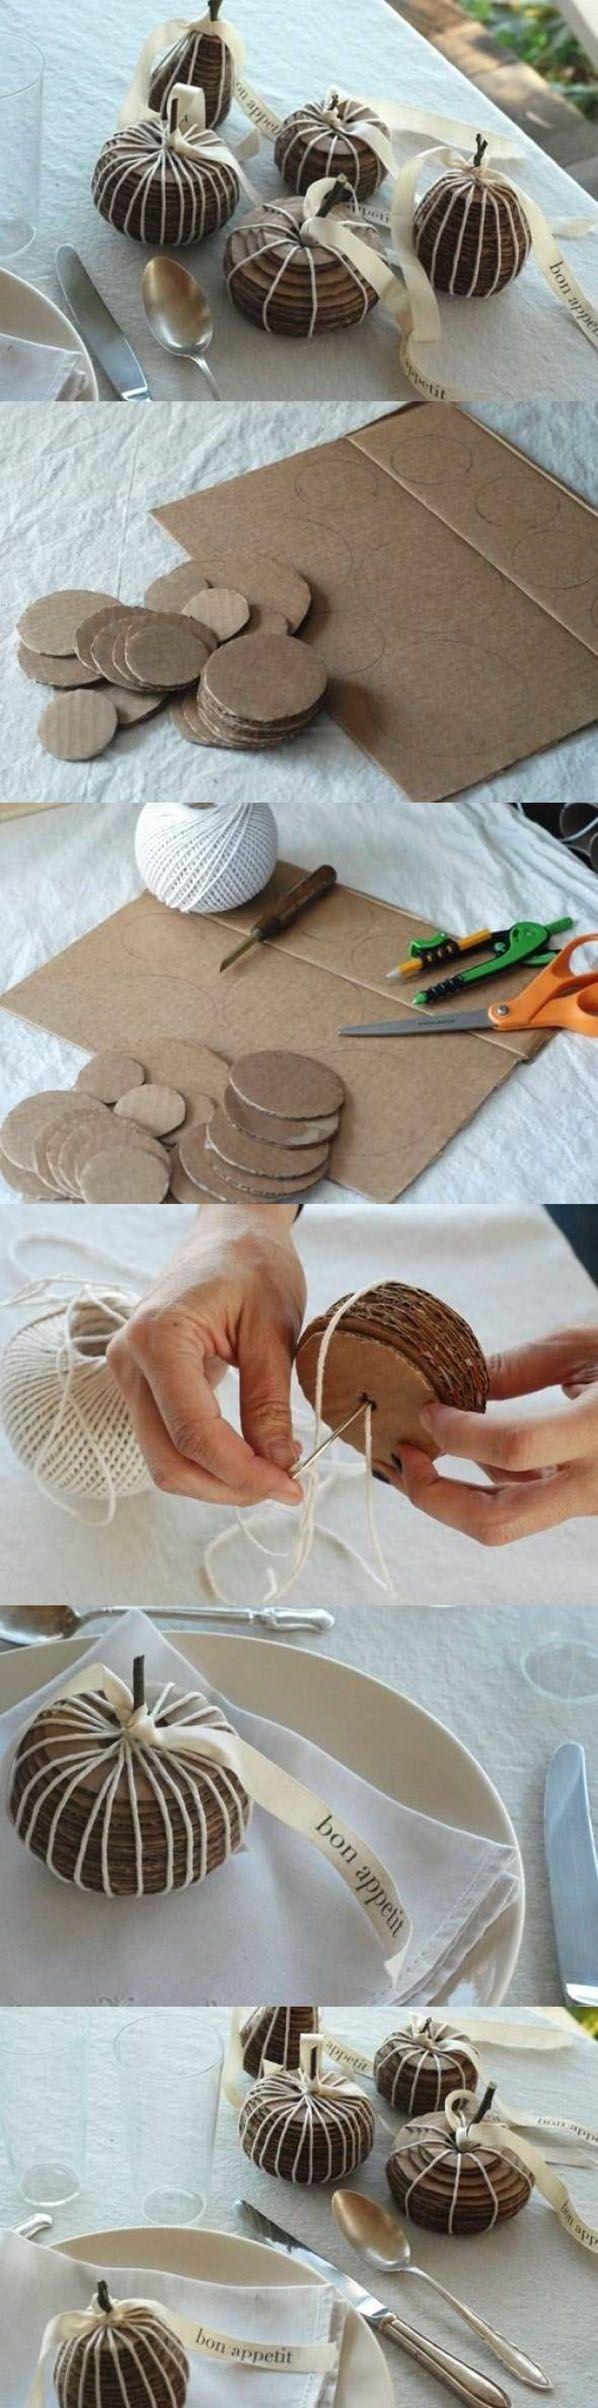 Cool Decoration Idea | DIY & Crafts Tutorials